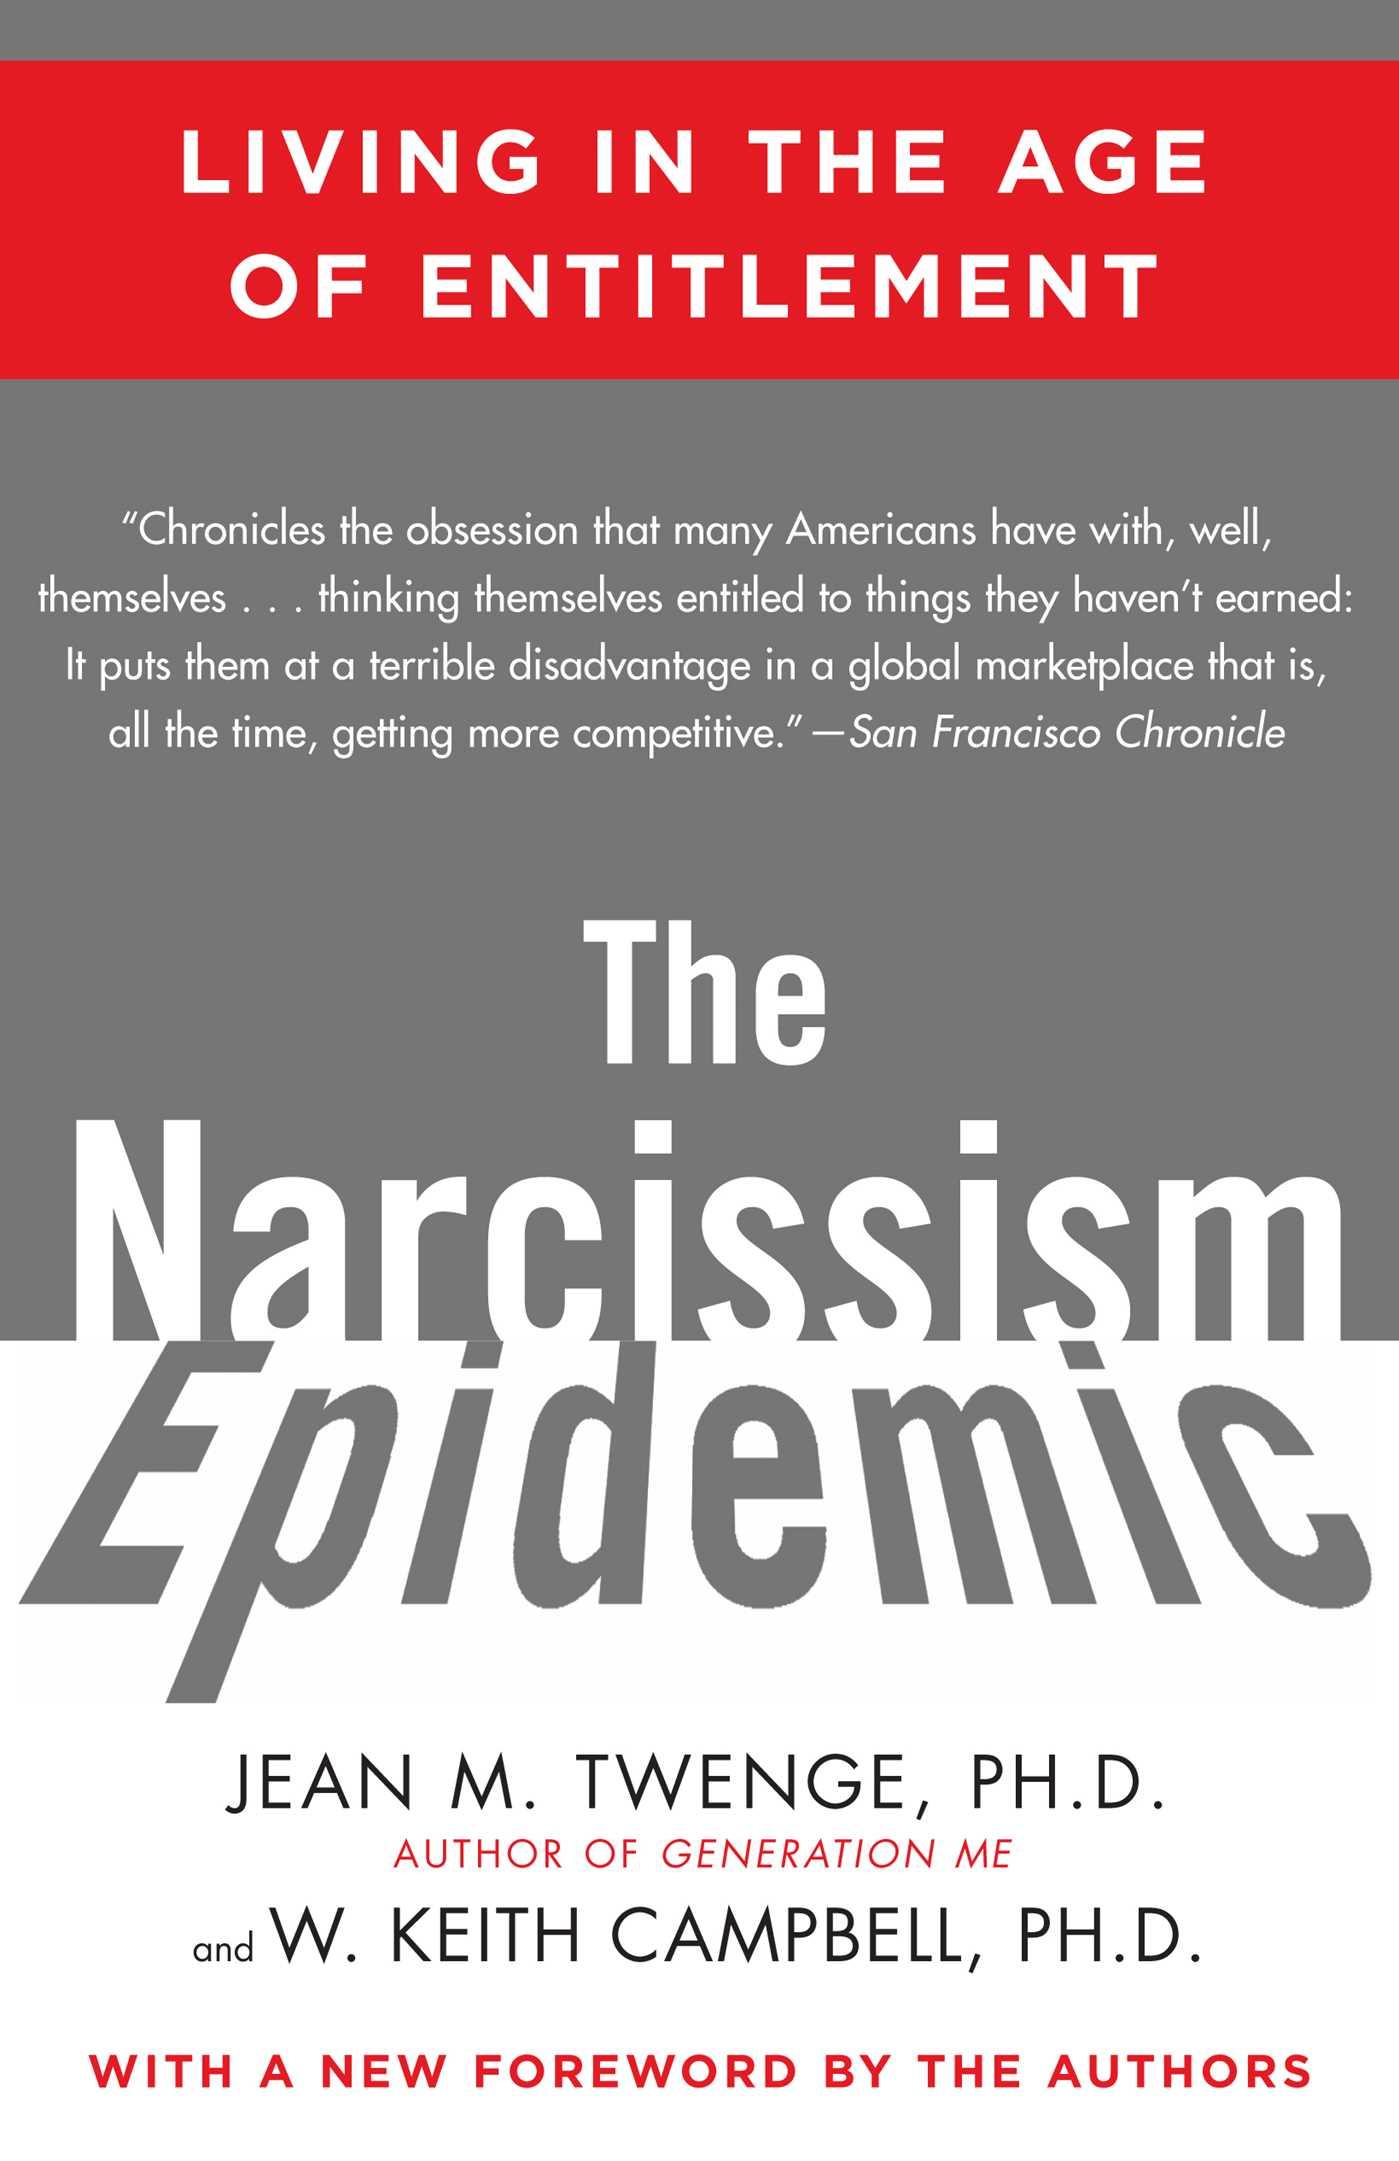 The narcissism epidemic 9781416576259 hr